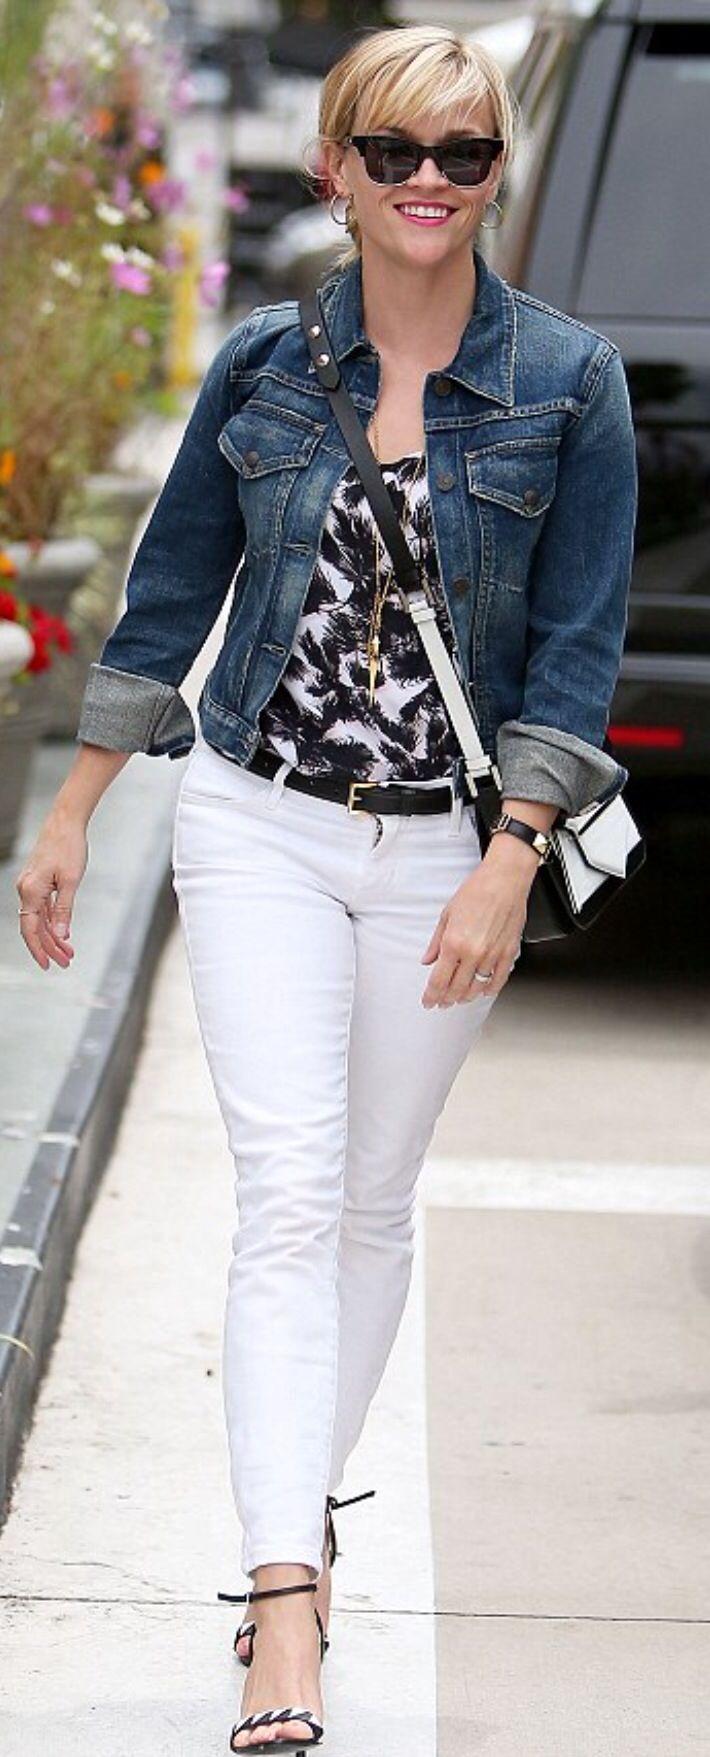 Denim Jacket Black White Top White Jeans How To Wear White Jeans White Denim Outfit How To Wear Denim Jacket